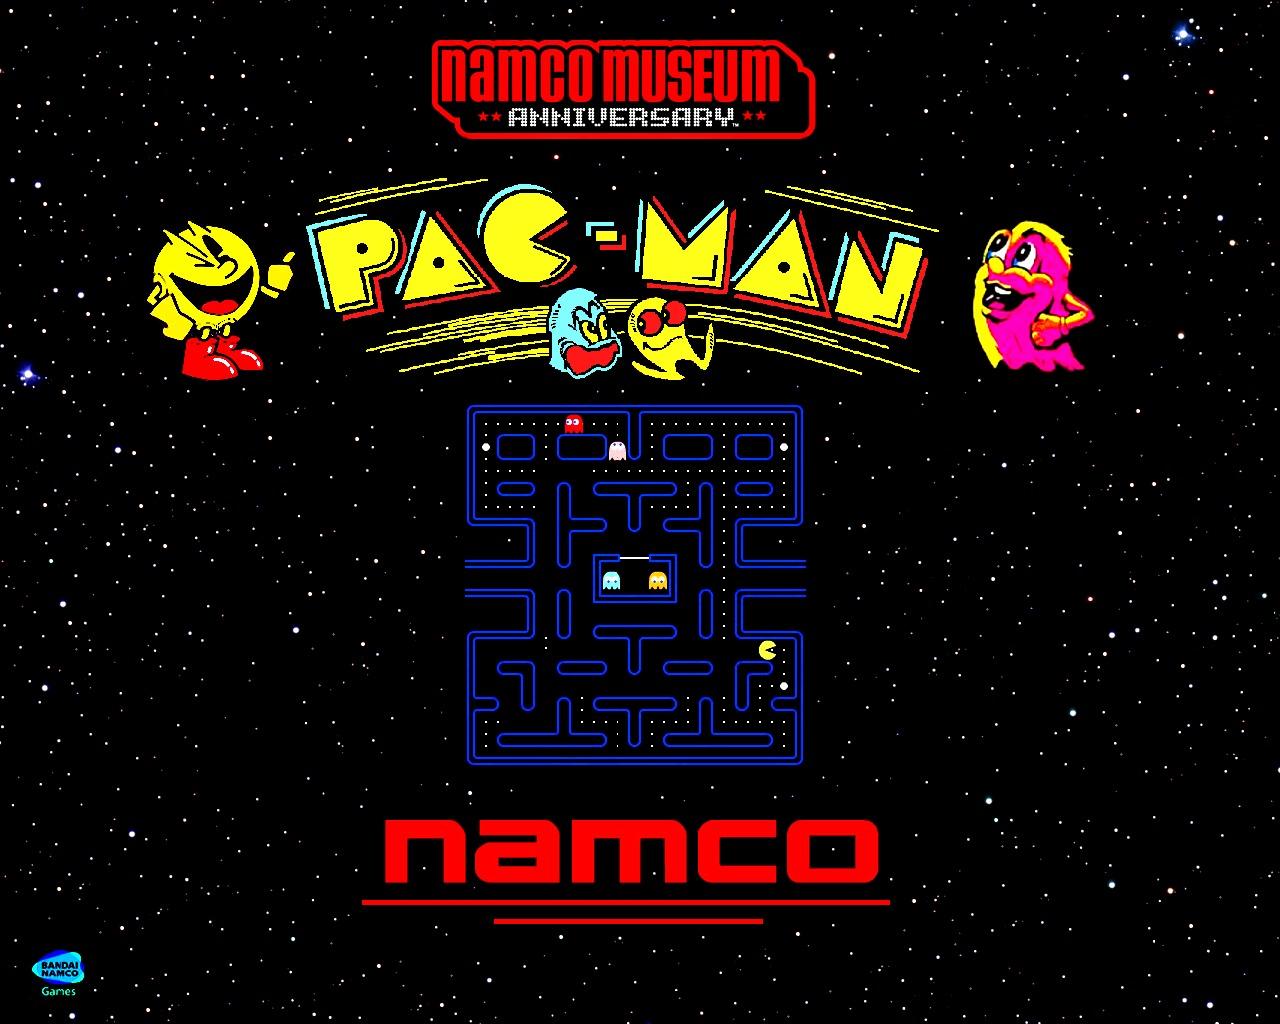 Pac man Mania 1280x1024